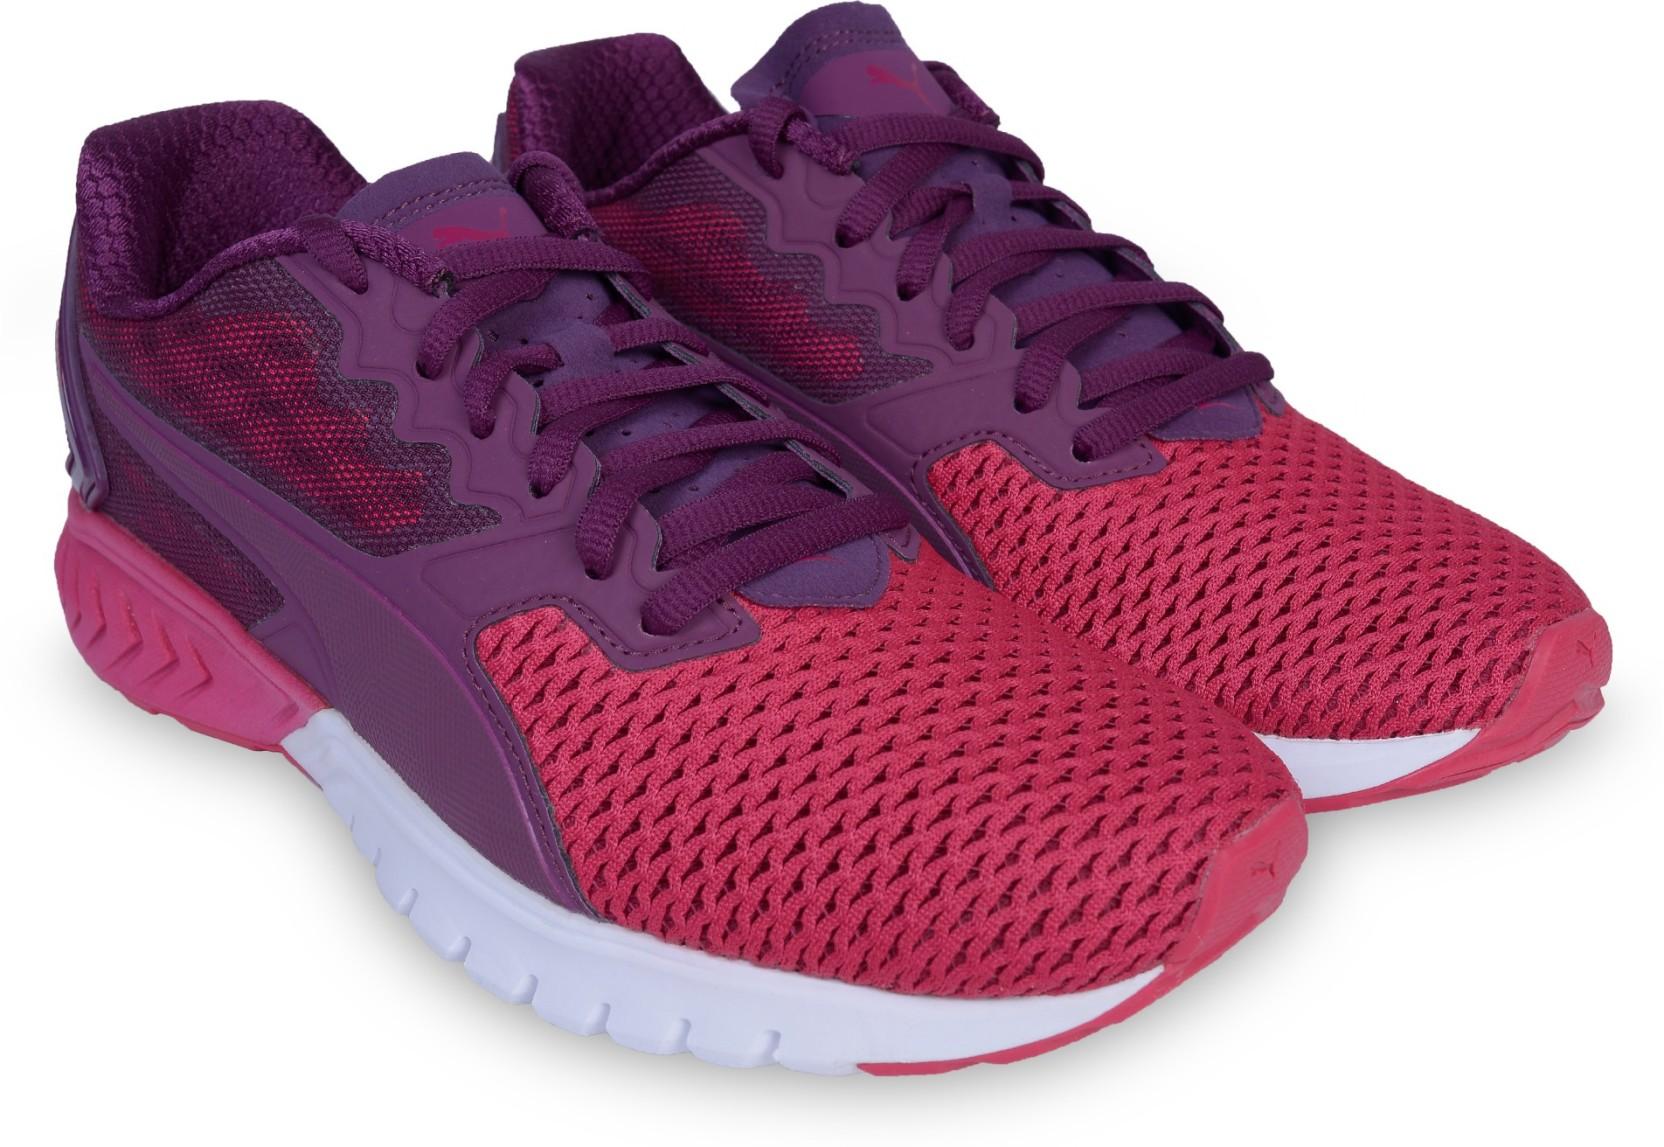 ea8e36fecf2b Puma IGNITE Dual Mesh Wn s Running Shoes For Women (Multicolor)